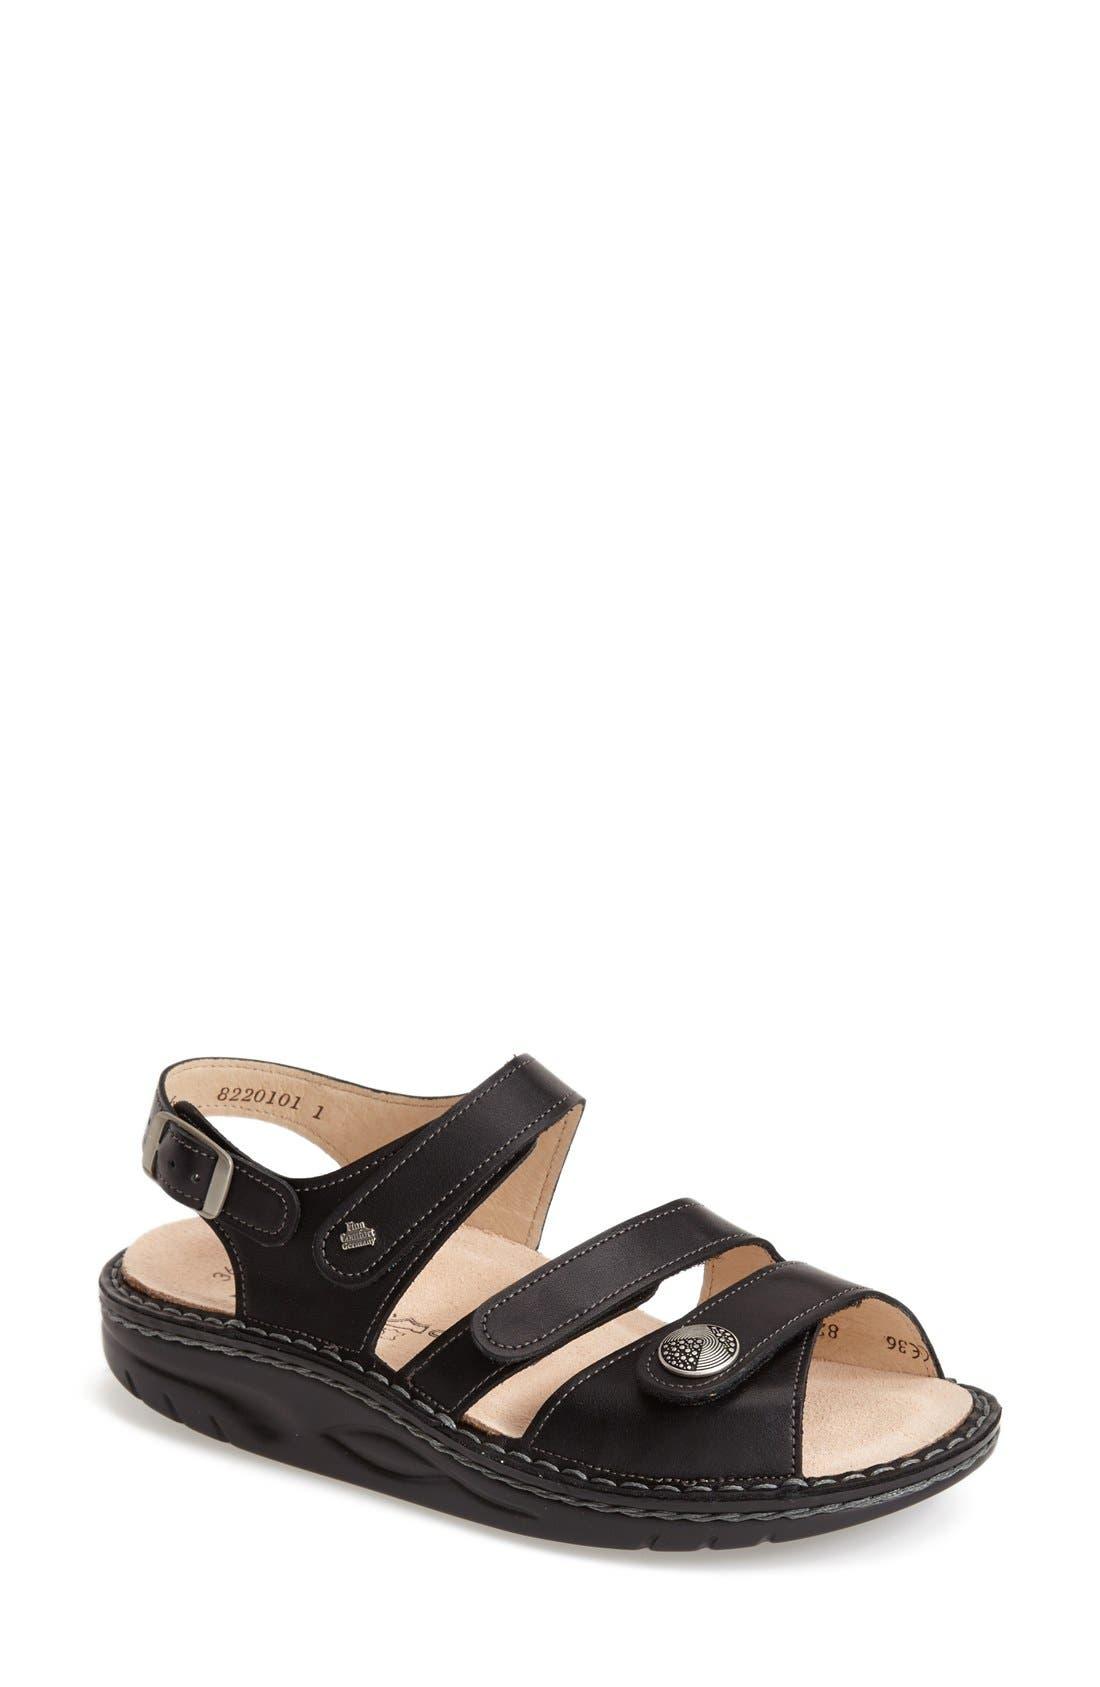 'Tiberias' Leather Sandal,                         Main,                         color, Black